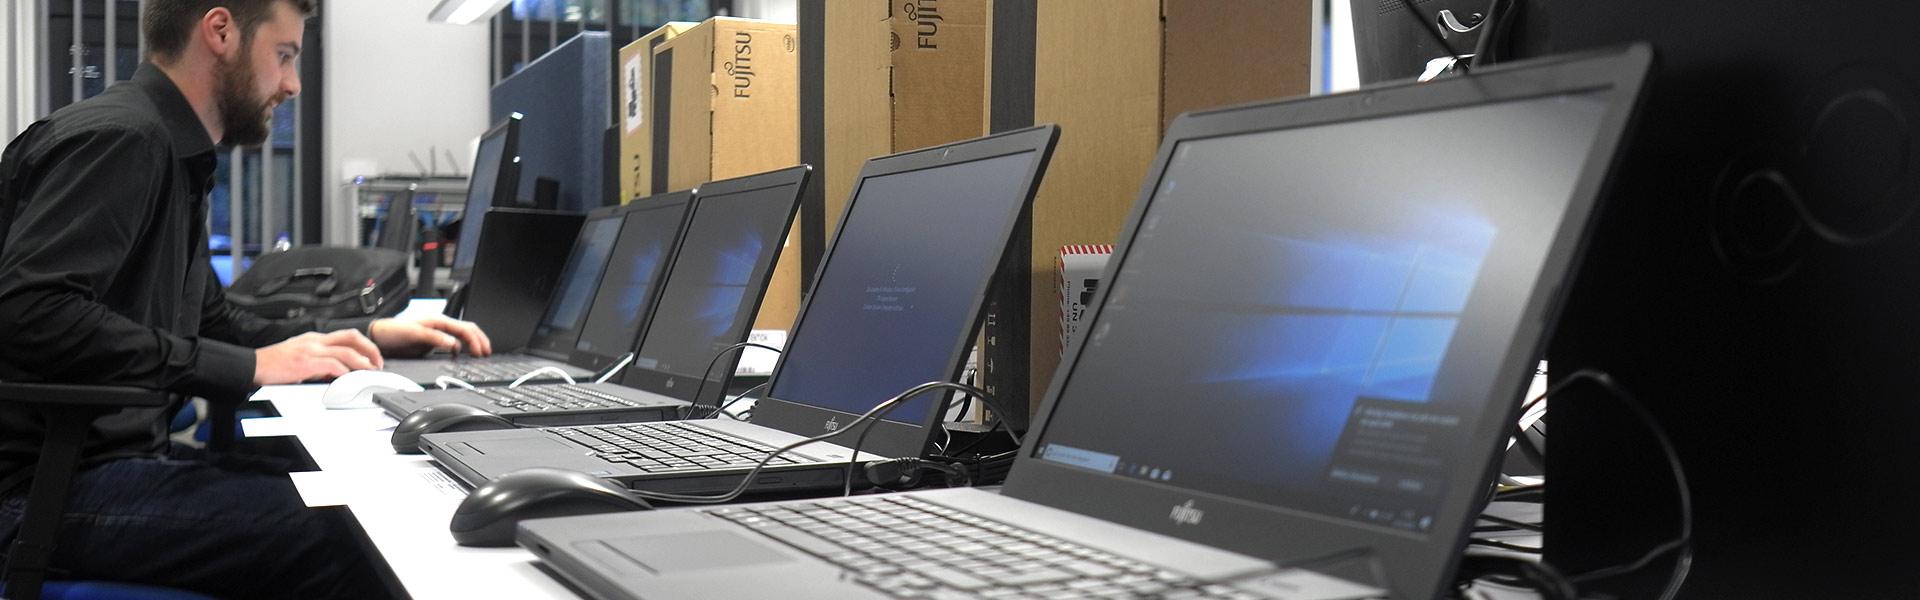 Banner Jobs bei cbo - Systemelektroniker